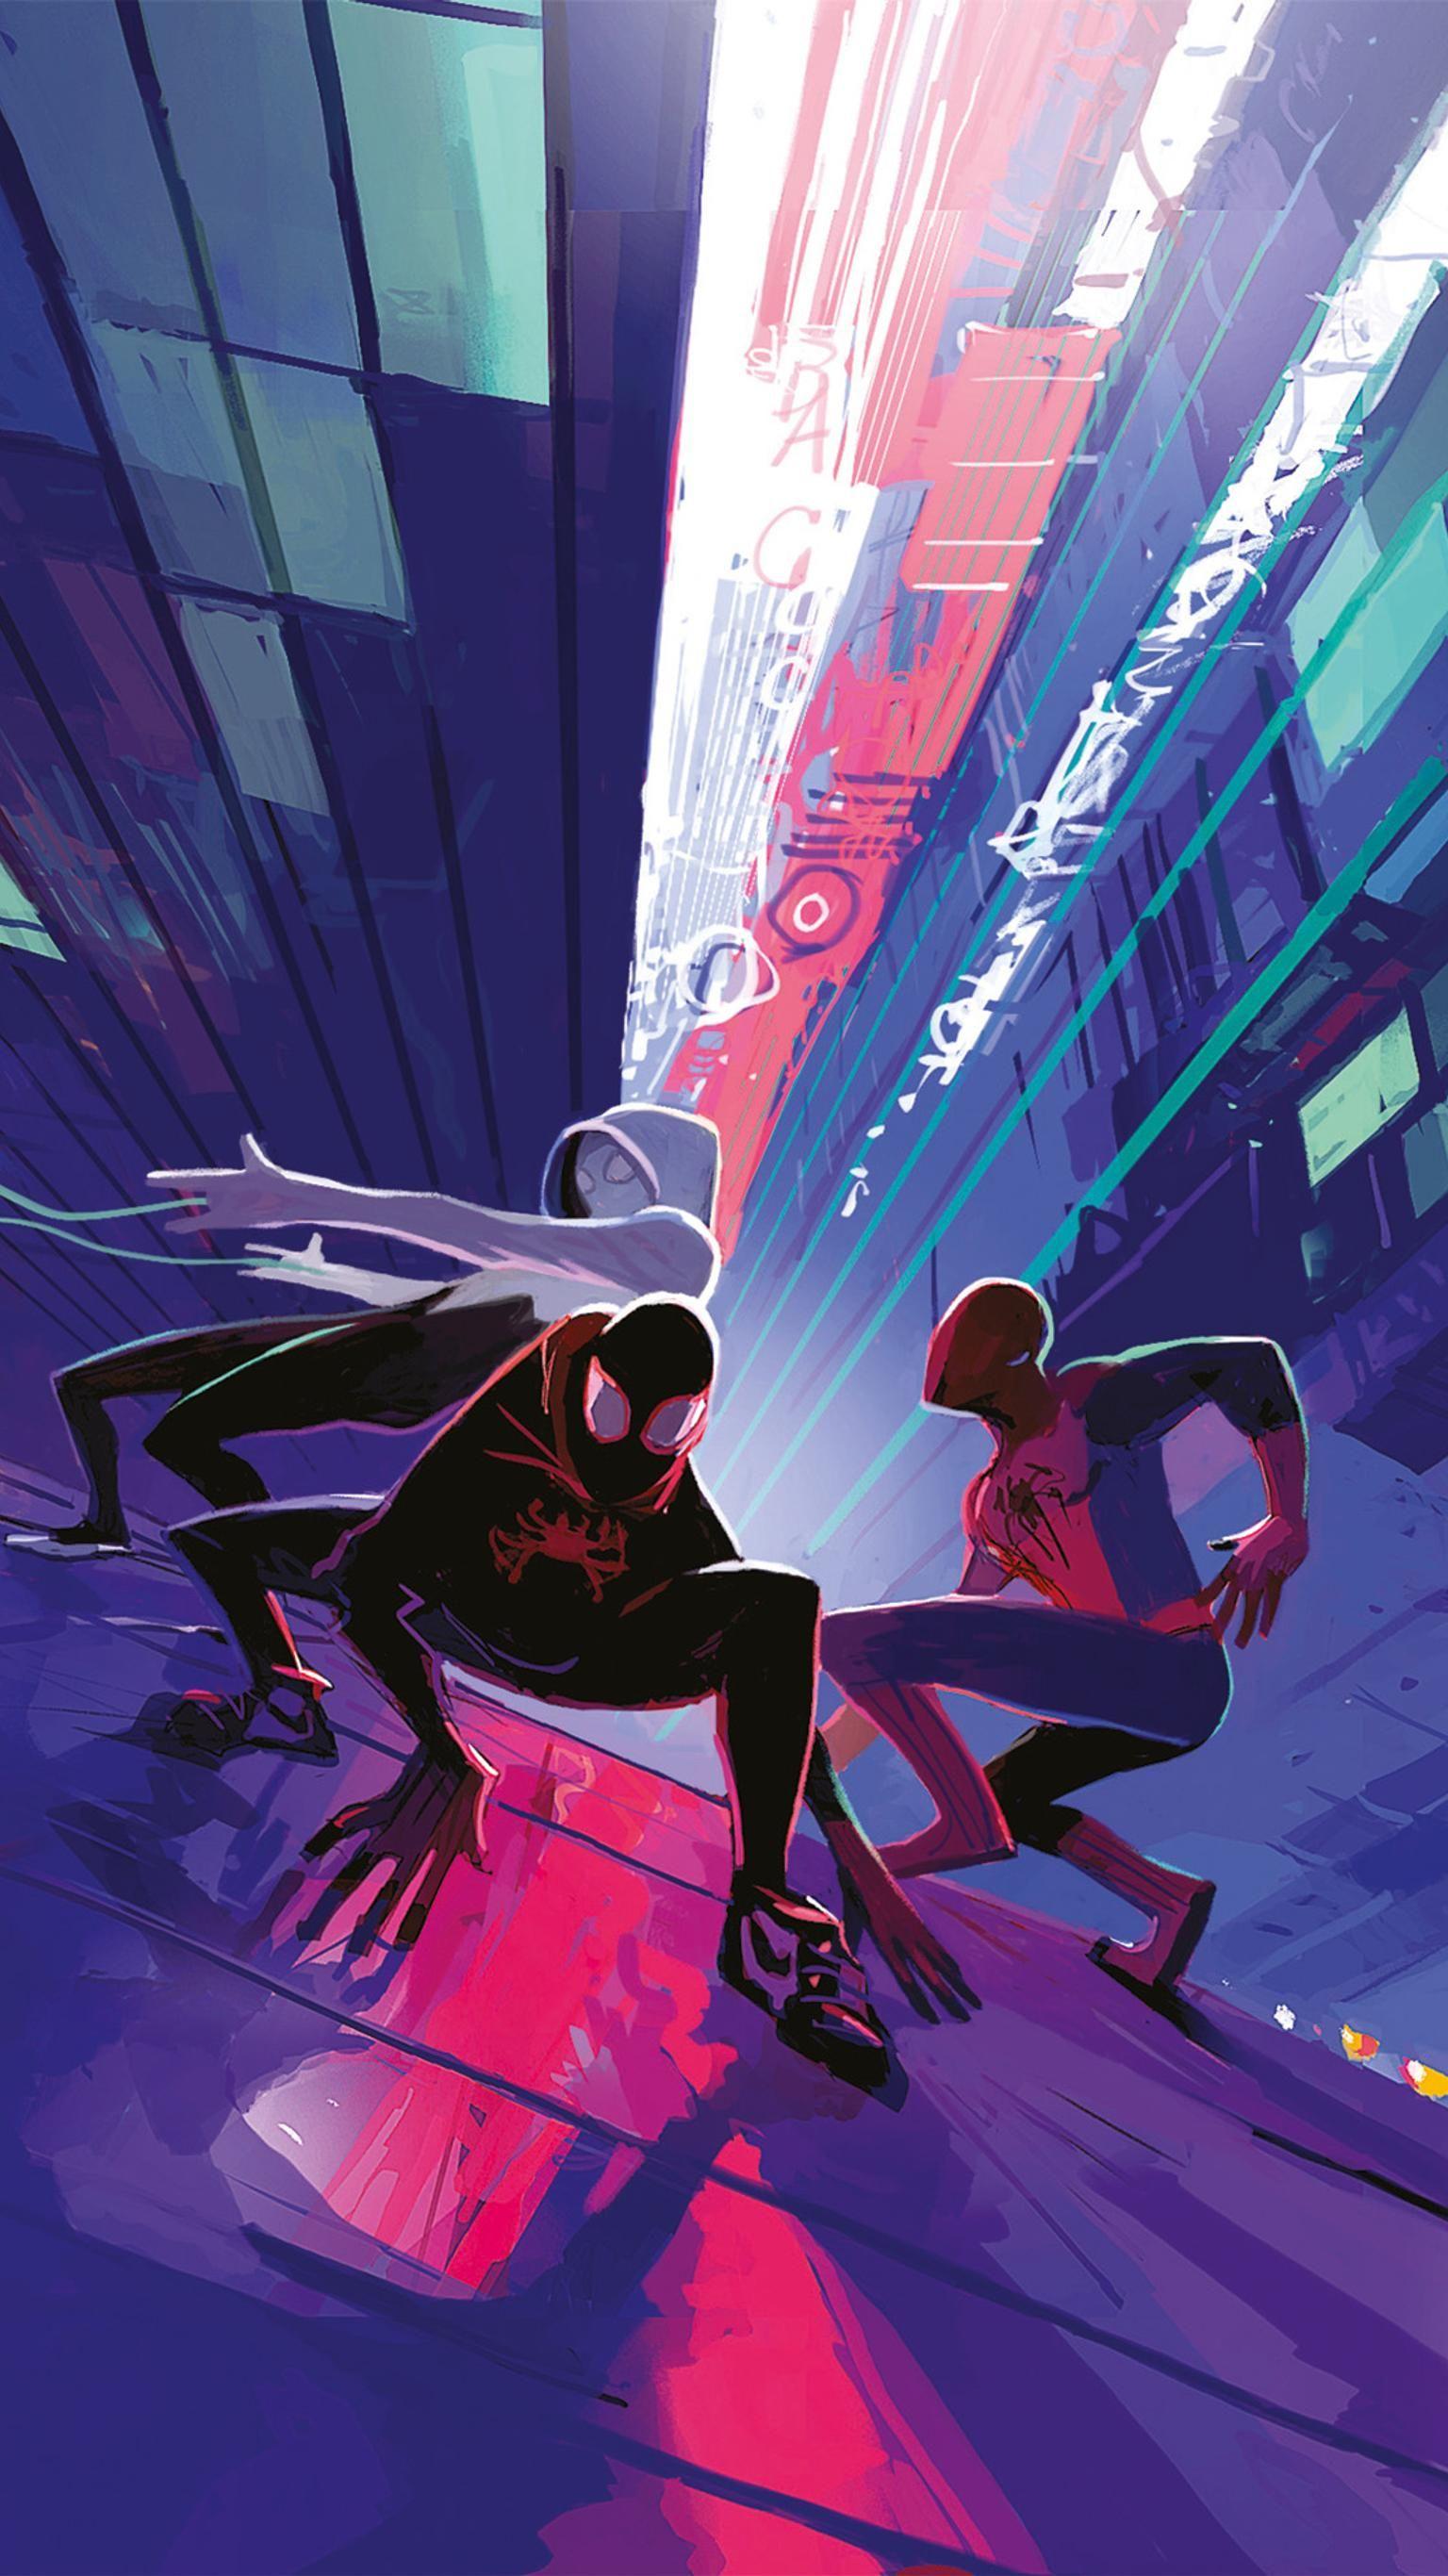 Spider-Man: Into the Spider-Verse (2018) Phone Wallpaper ...